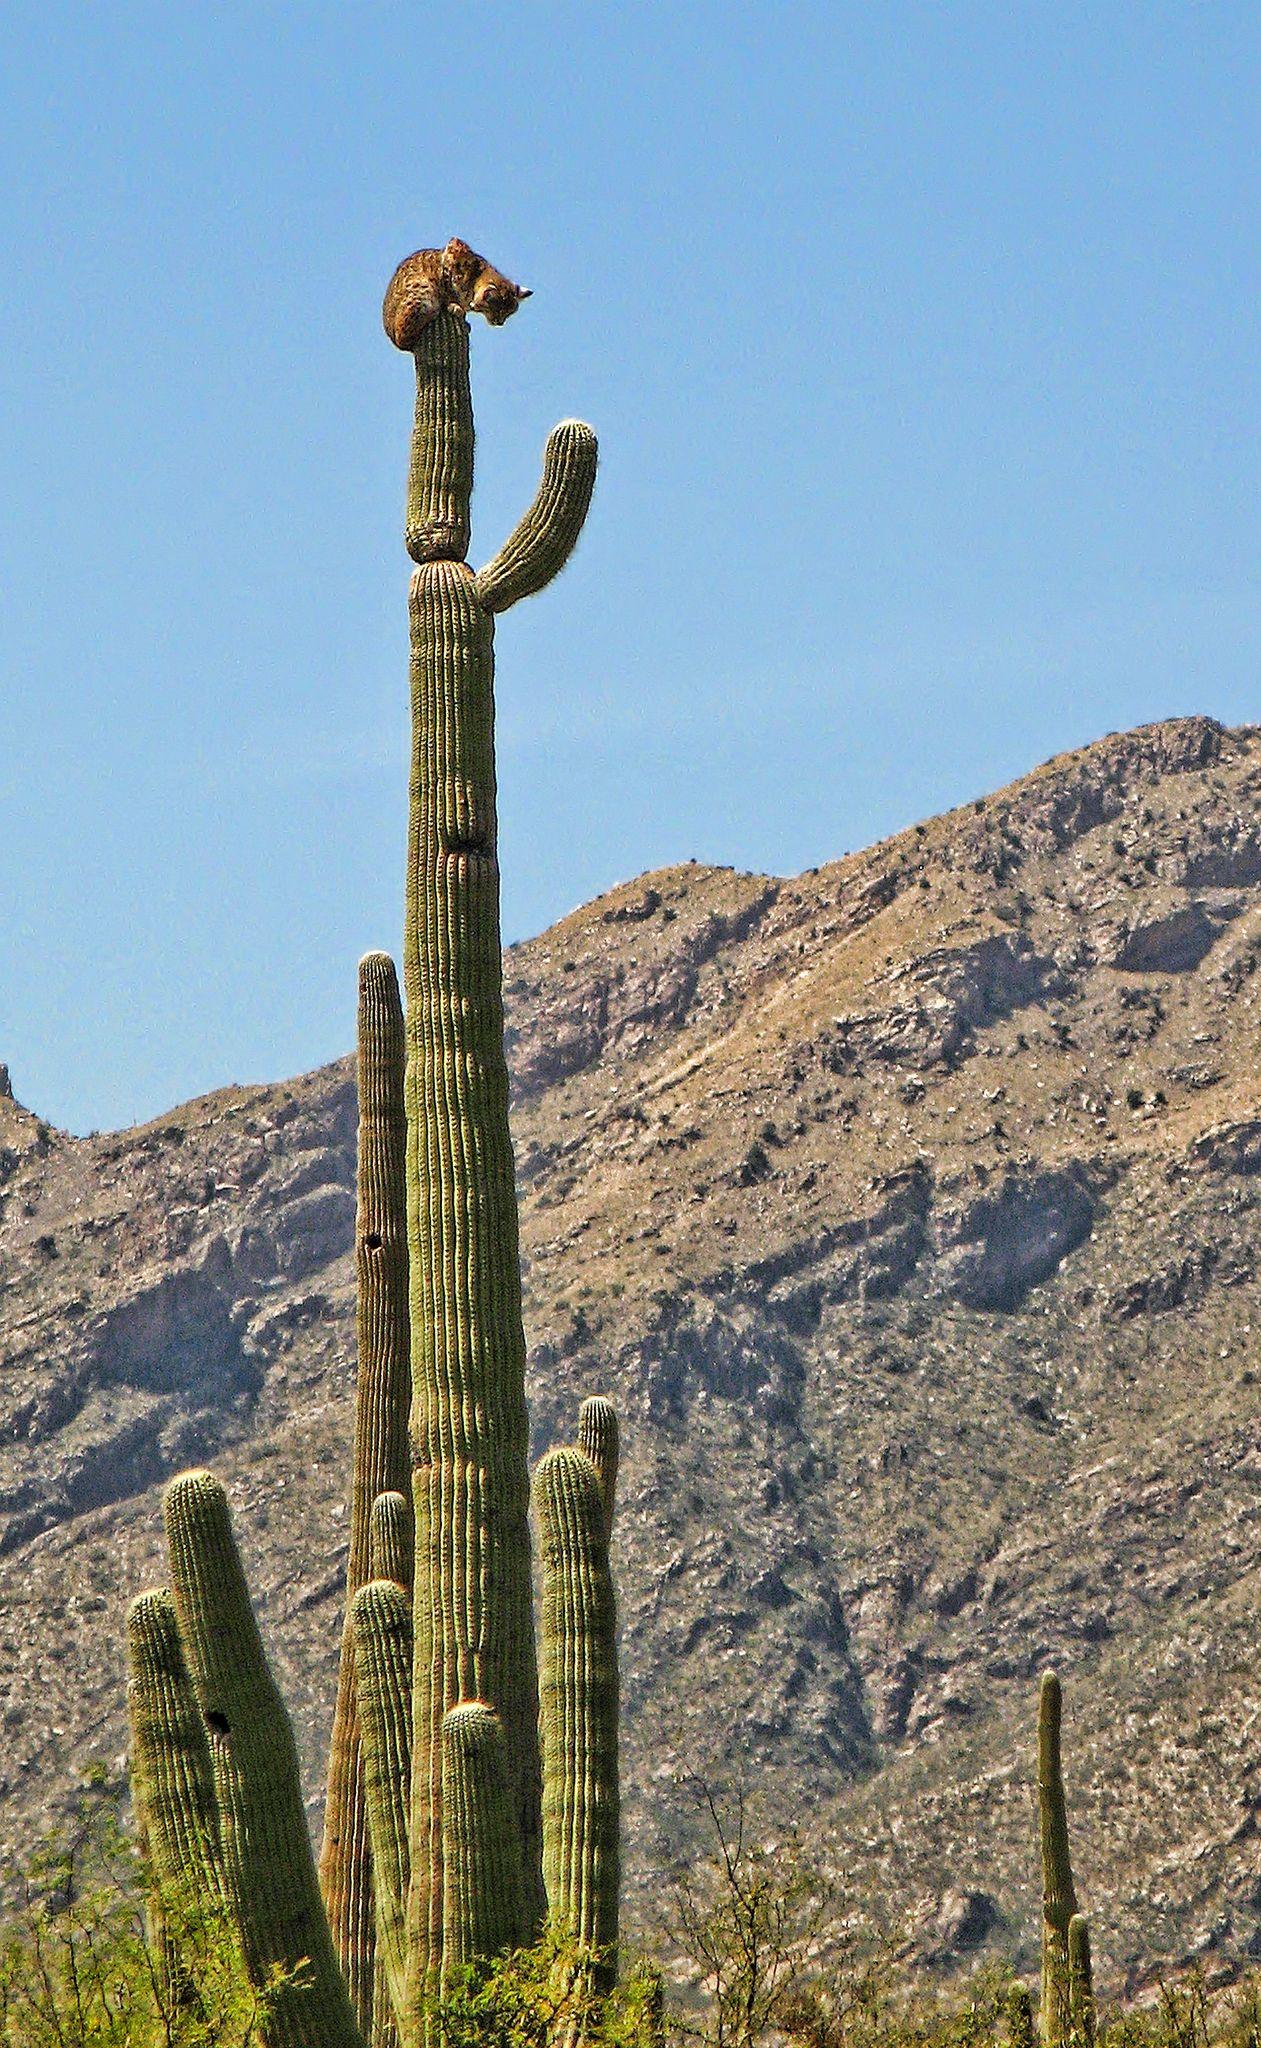 bobcat on saguaro cactus, Sabino Canyon Cacti, Animal